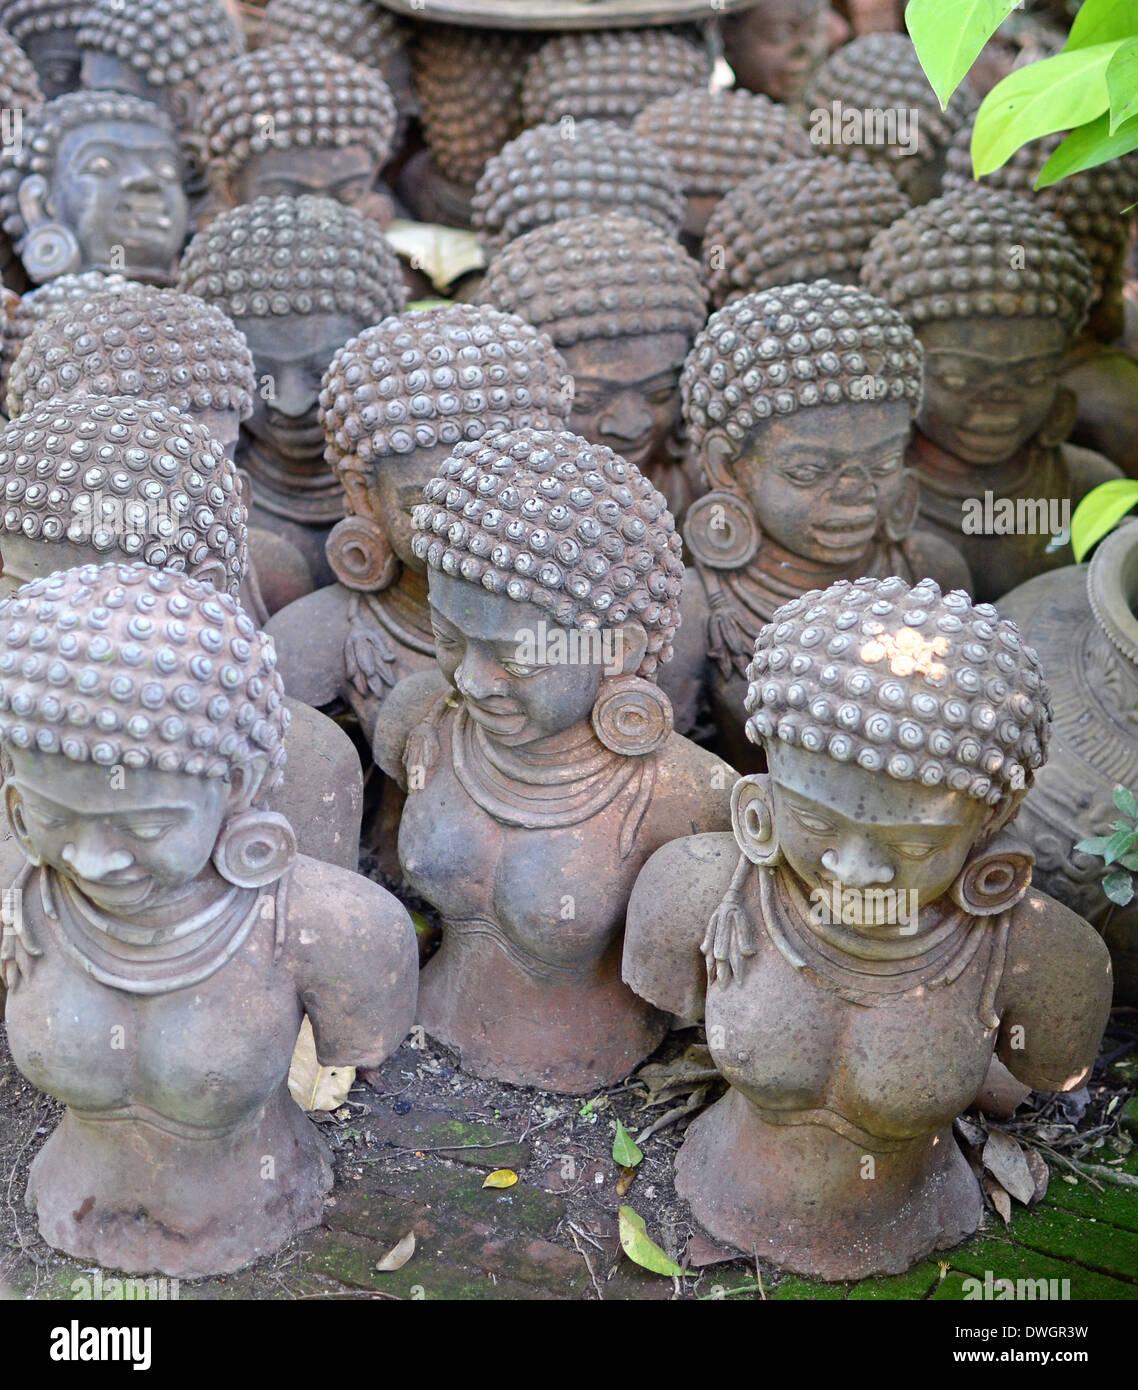 Ancient Sculptures In The Garden Stock Photo 67366877 Alamy